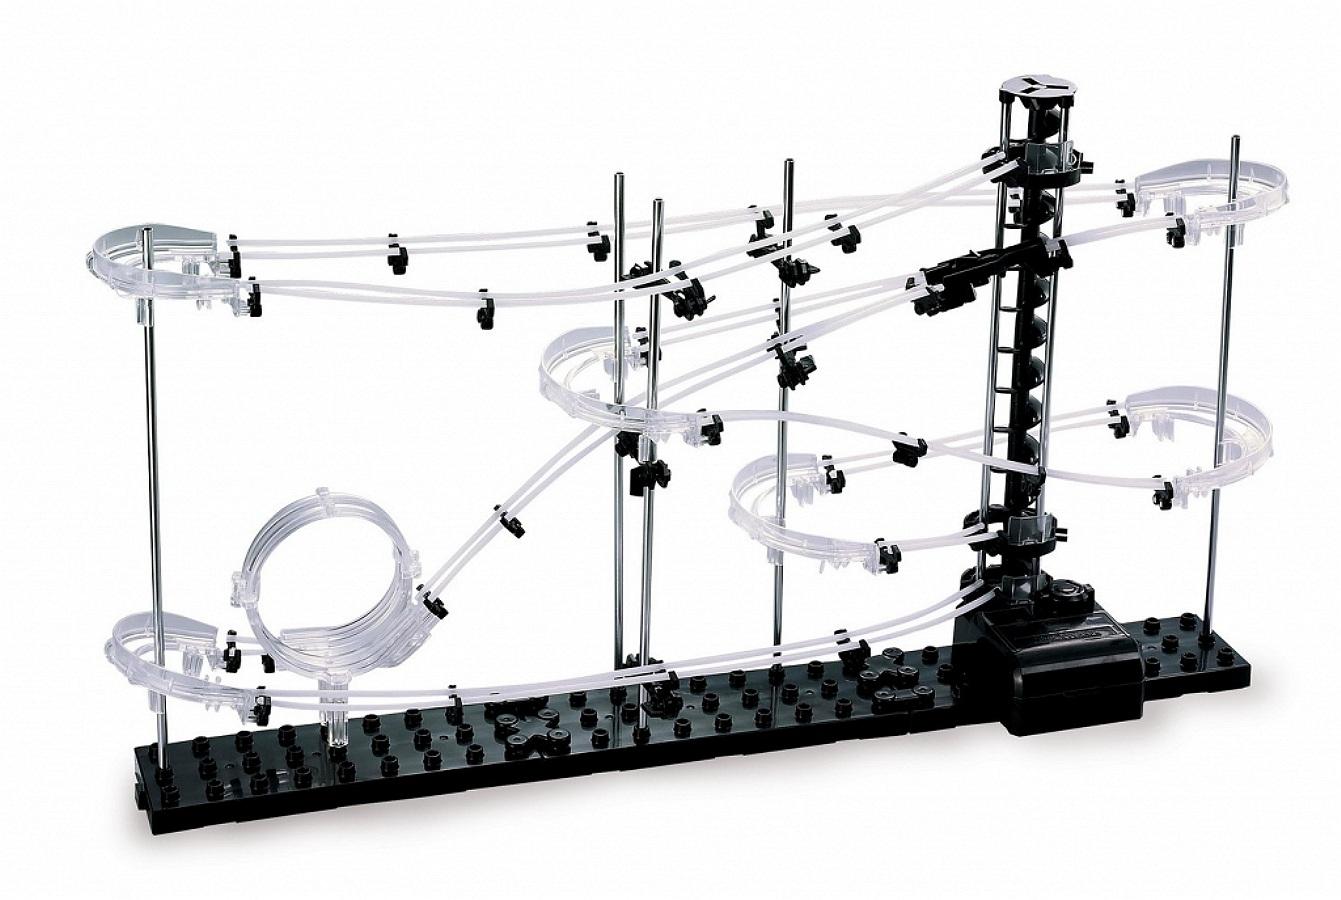 Spacerail - konstrukcja